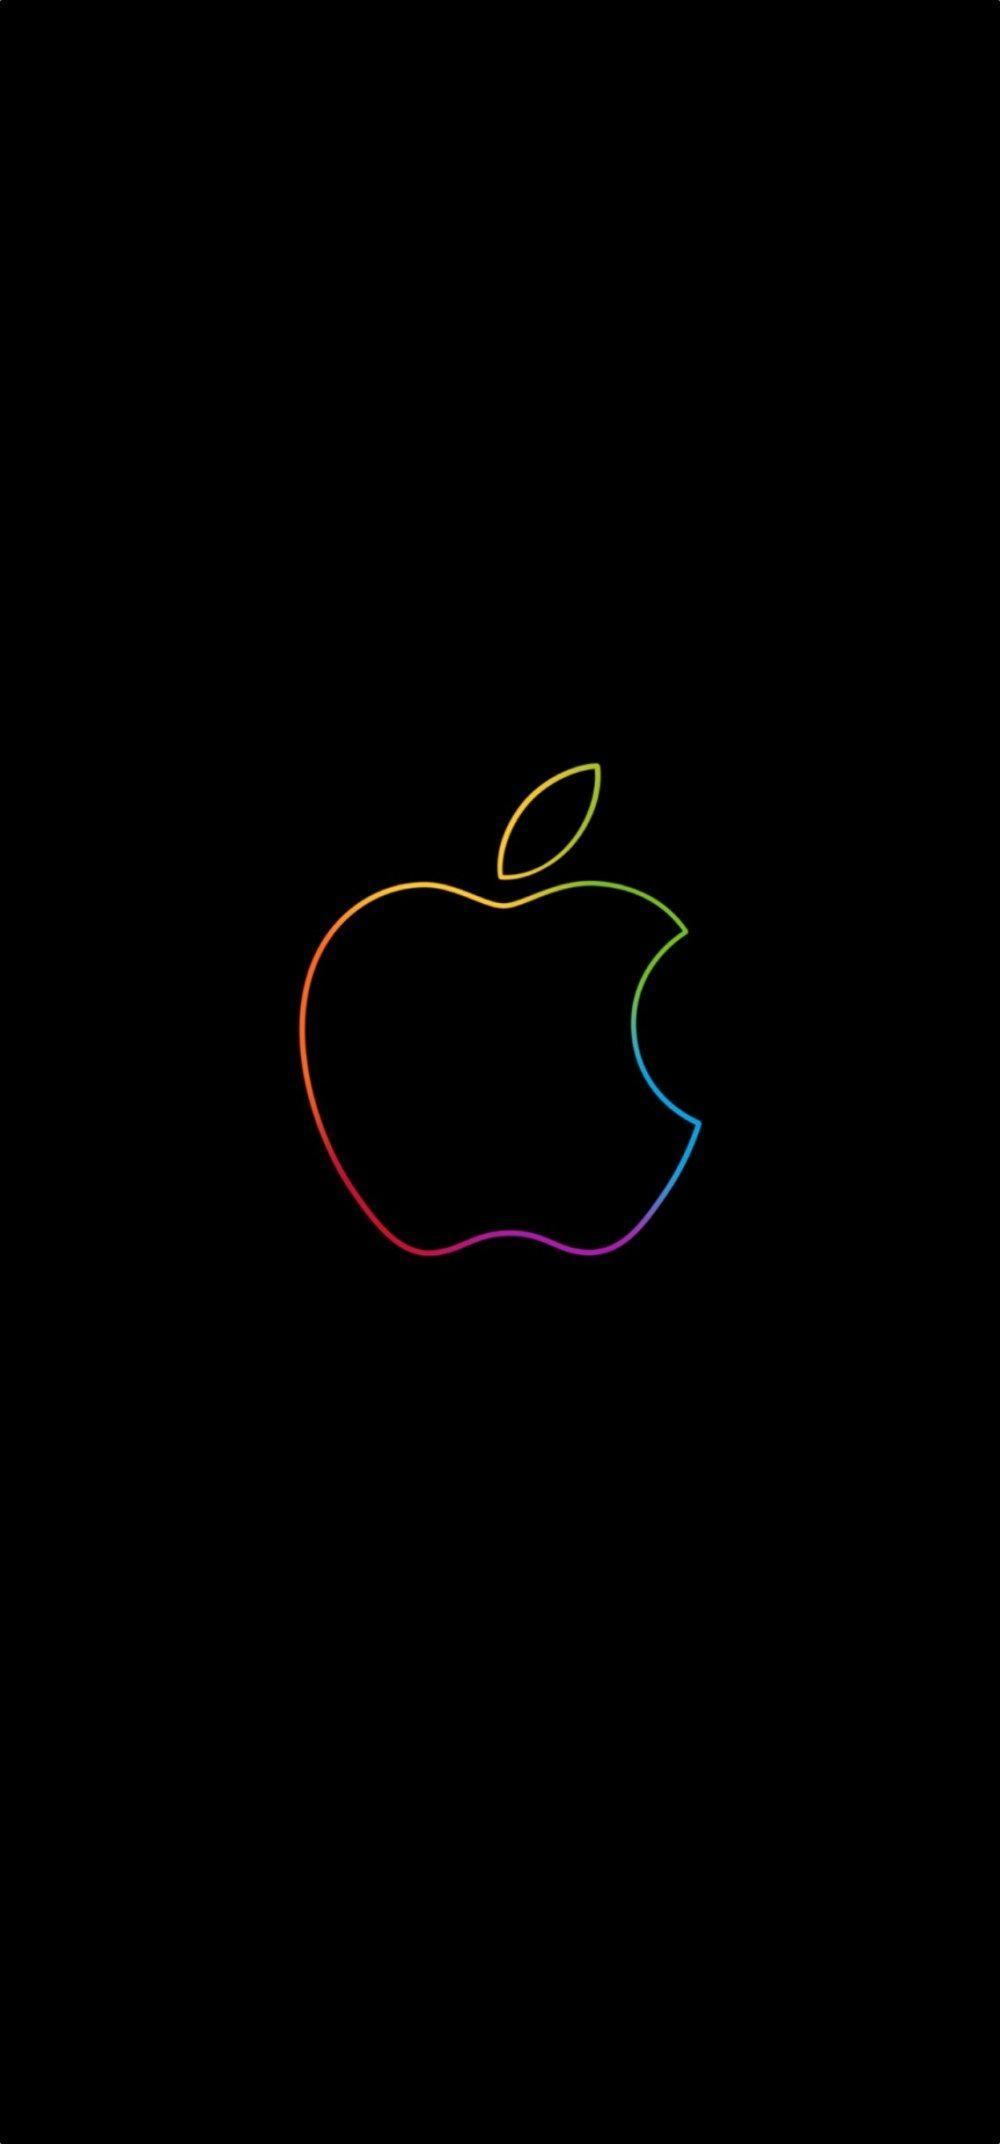 Iphone Logo Logodix